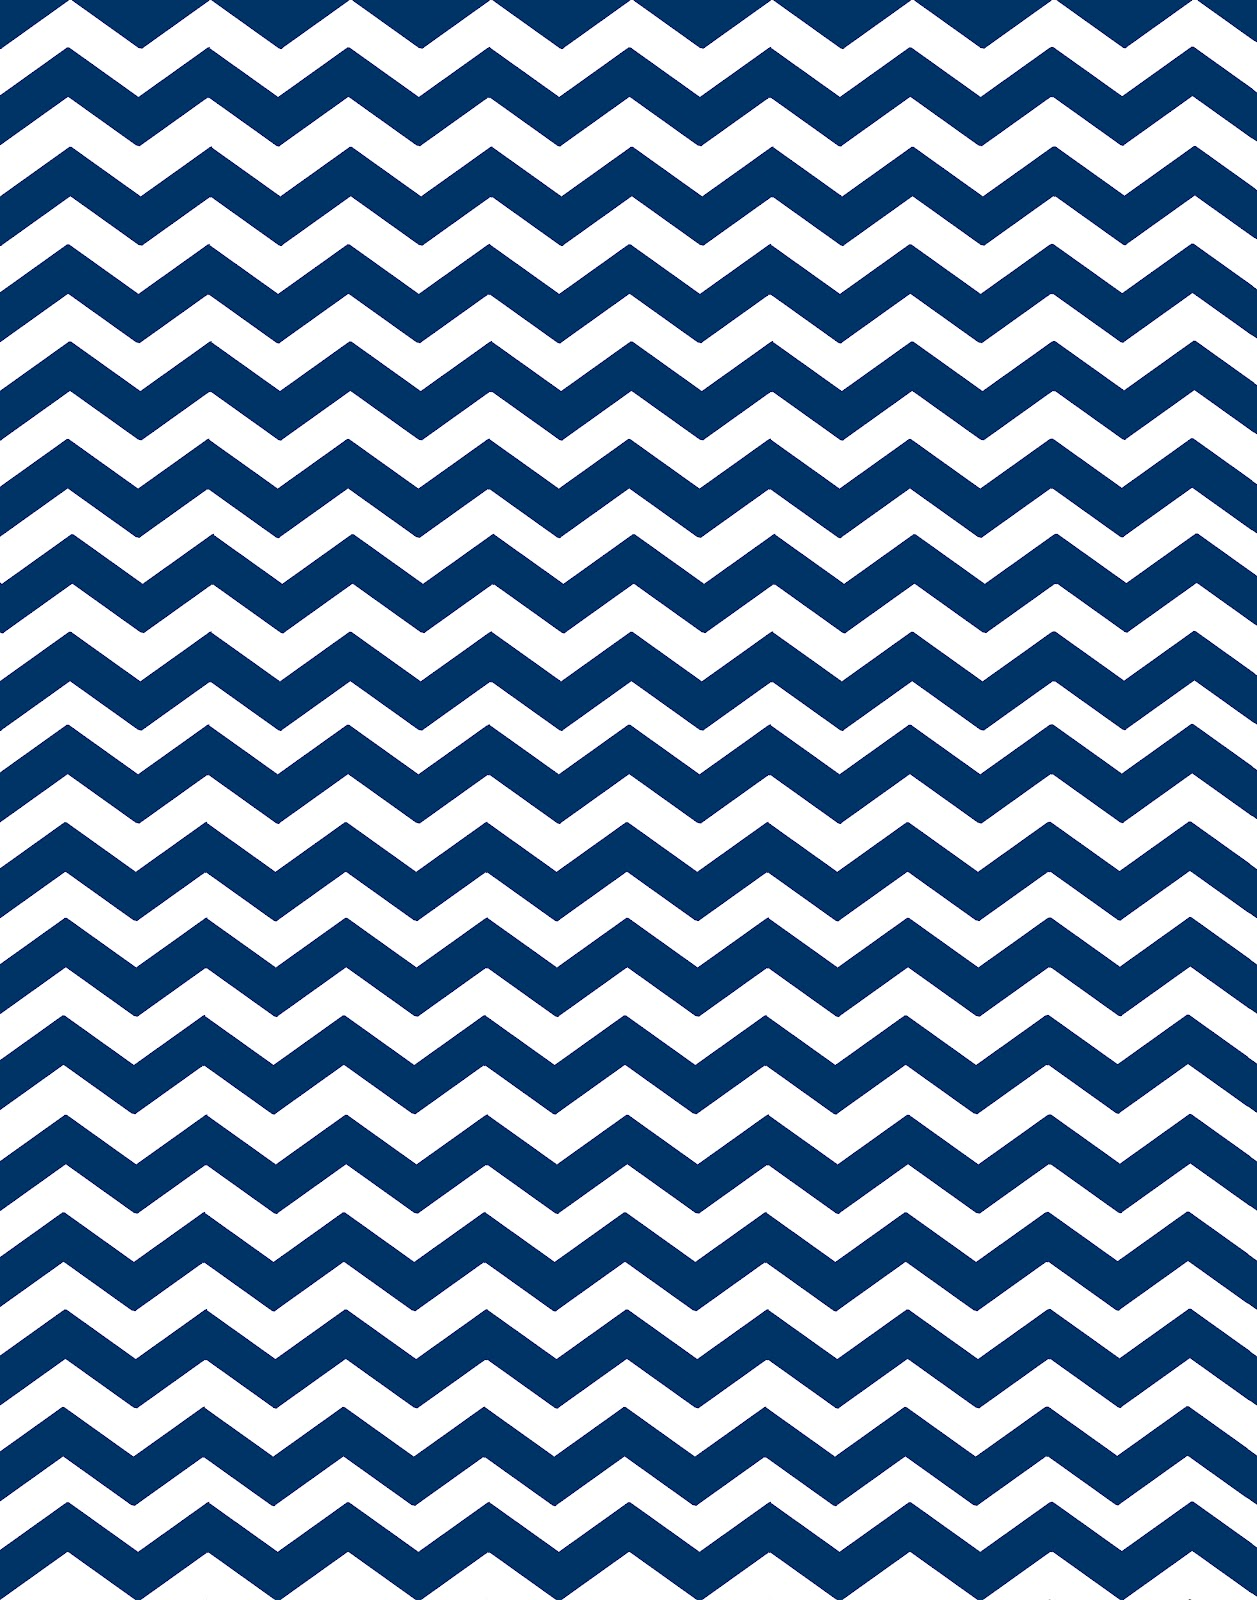 Navy background round designs. Chevron clipart royal blue